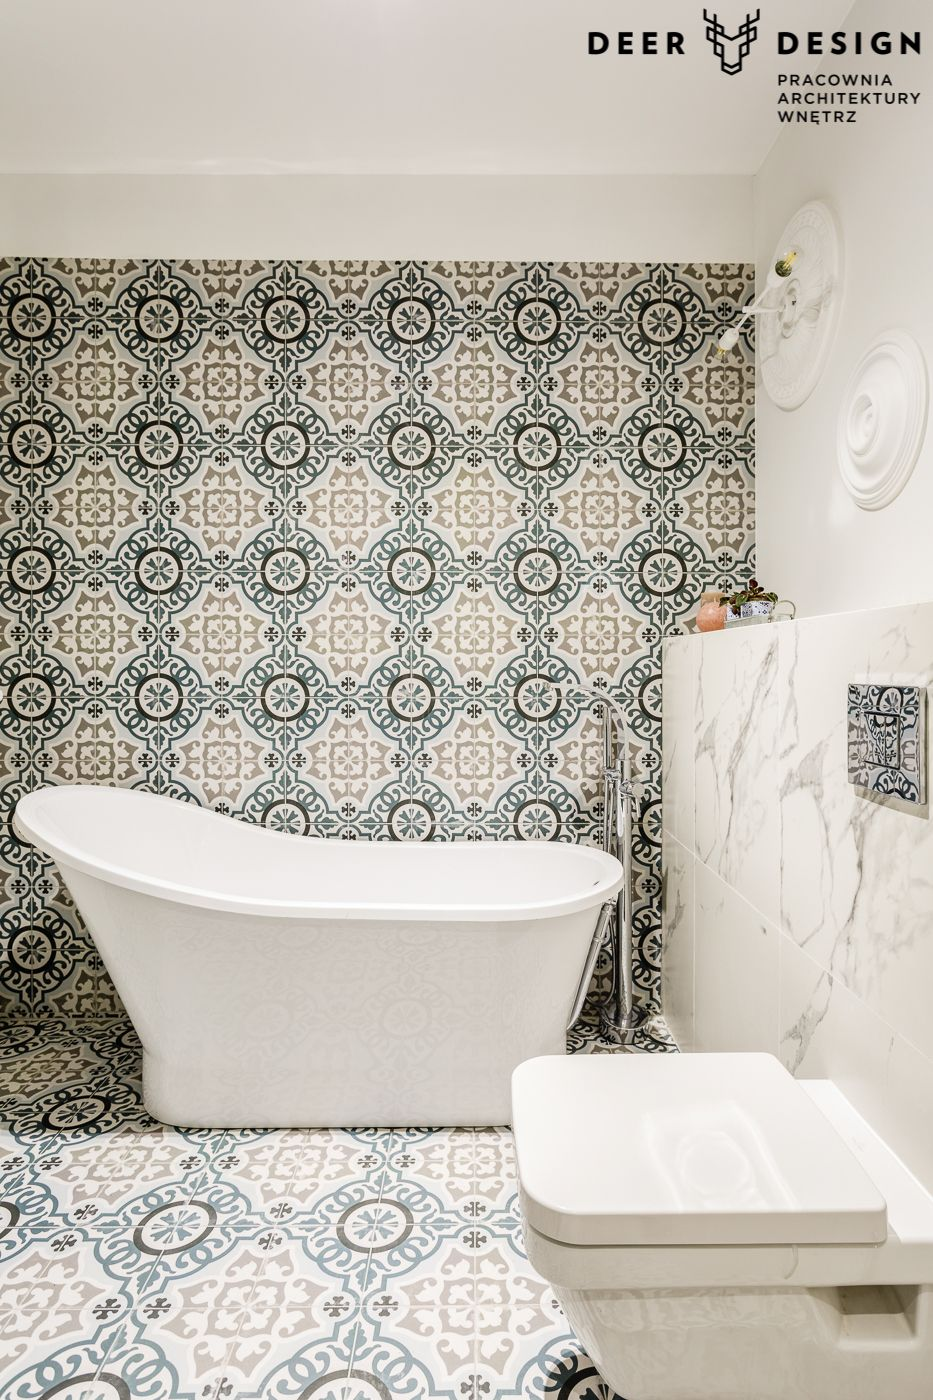 Lazienka Bathtub Bathroom Alcove Bathtub